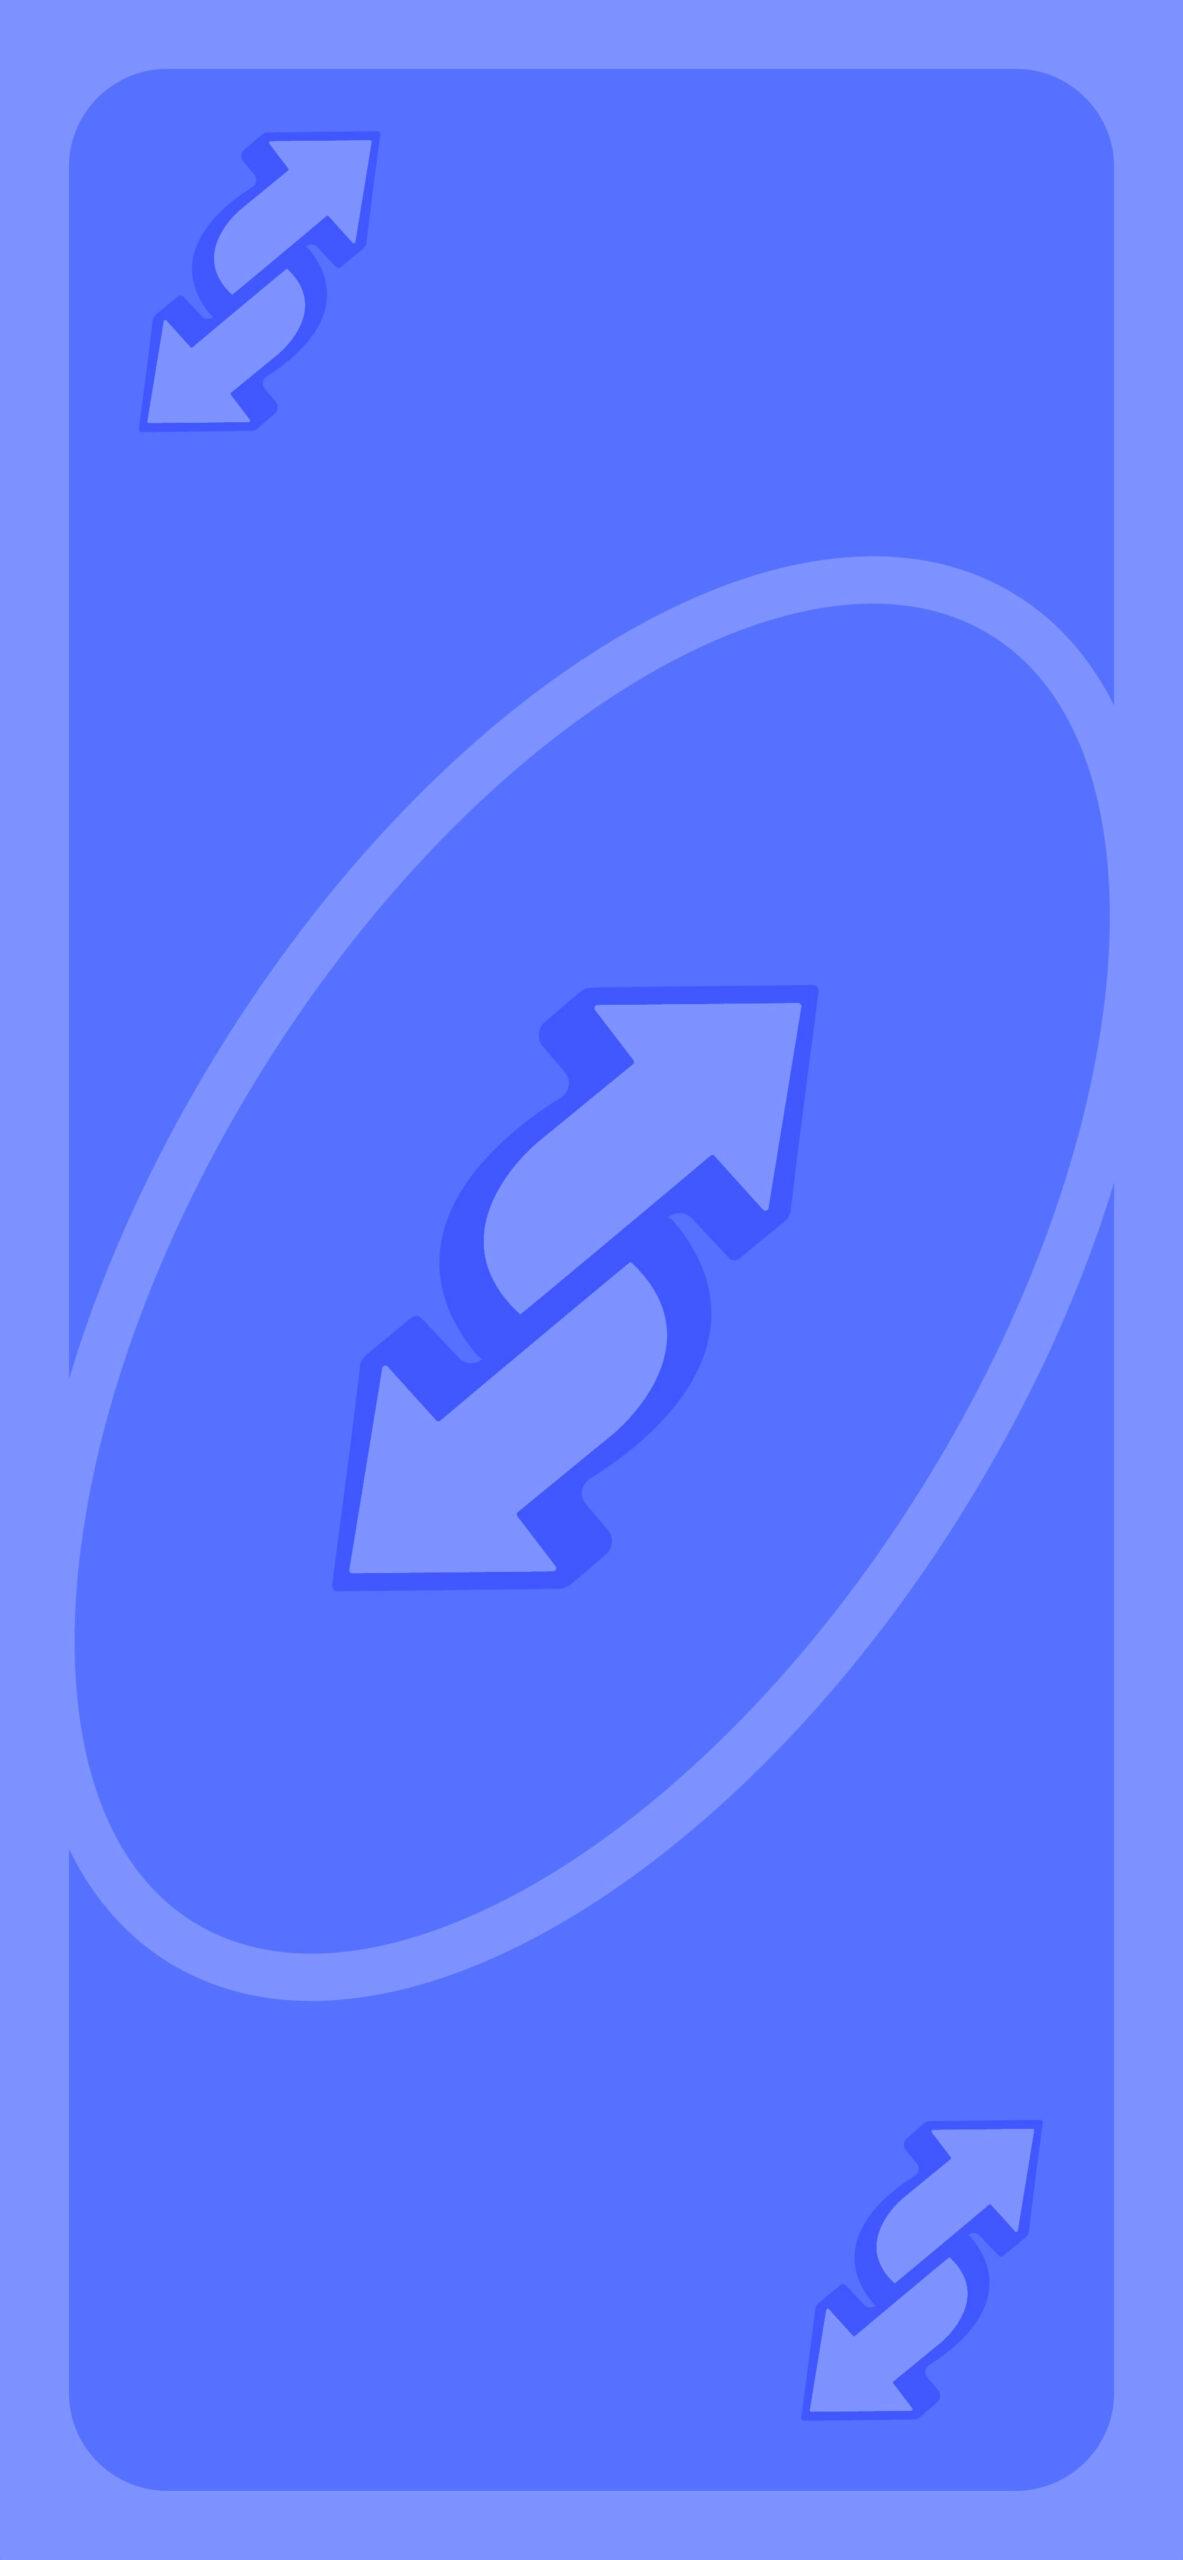 uno reverse card meme blue Background